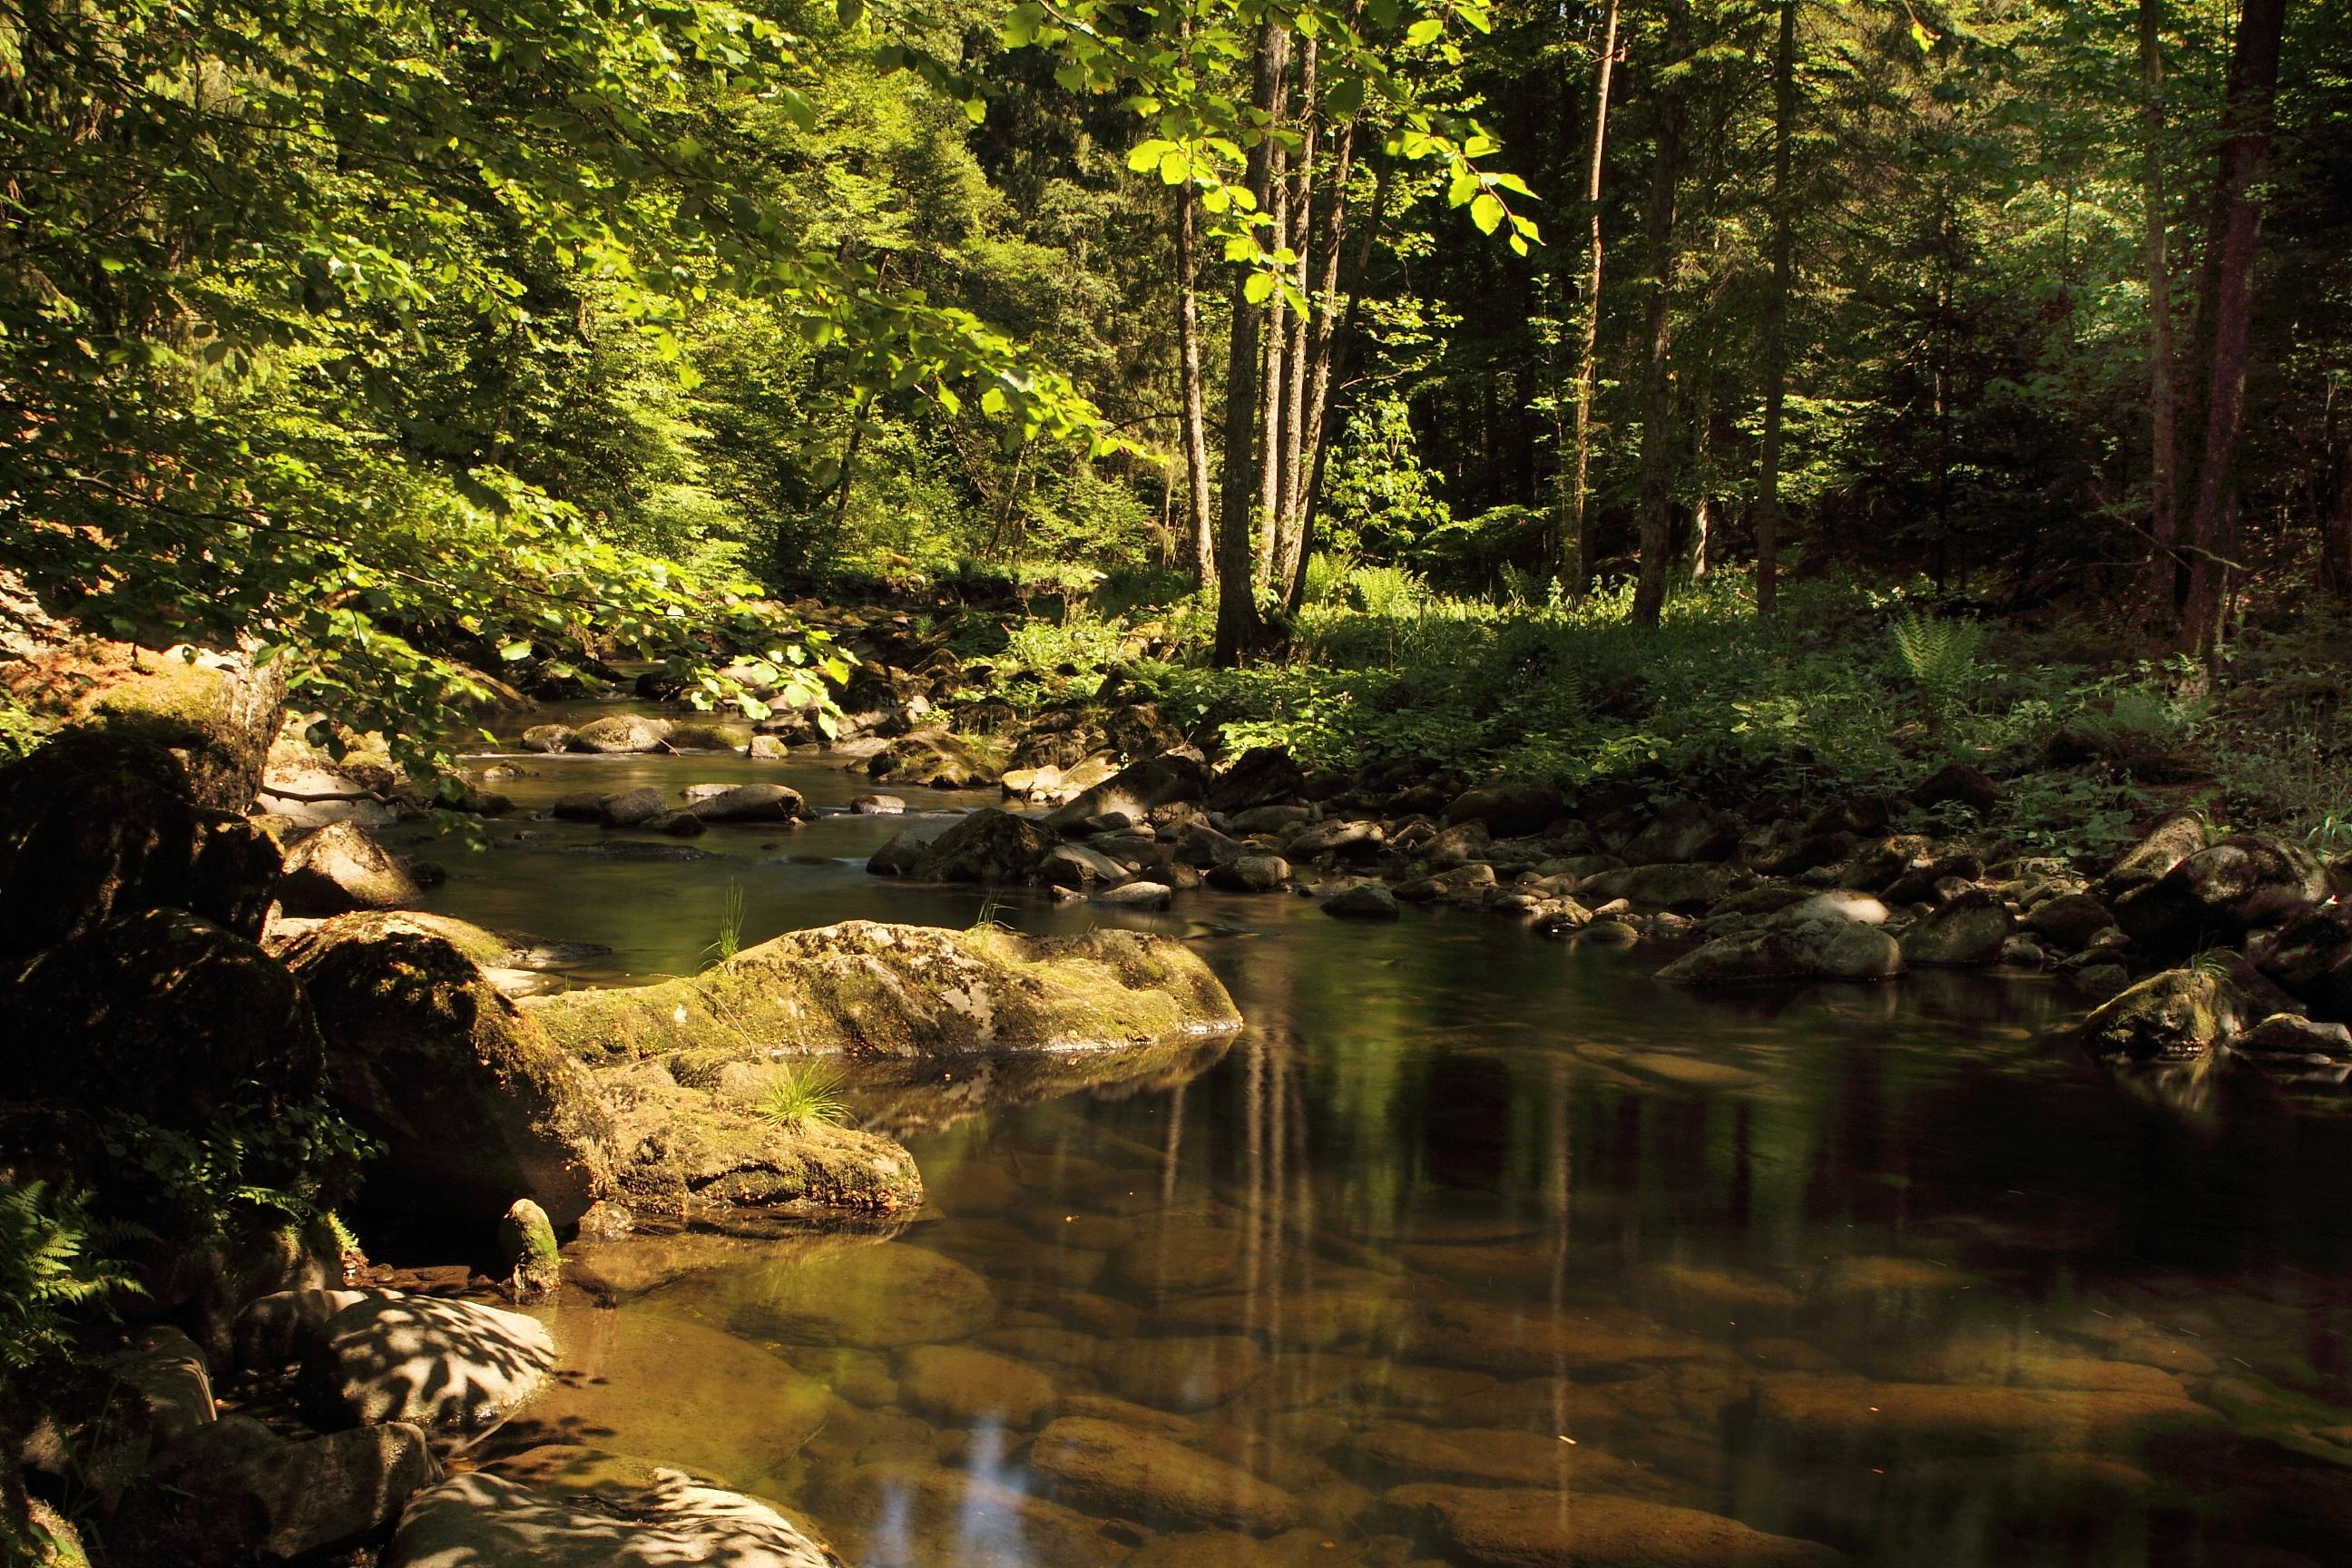 Река текущая по камням без смс